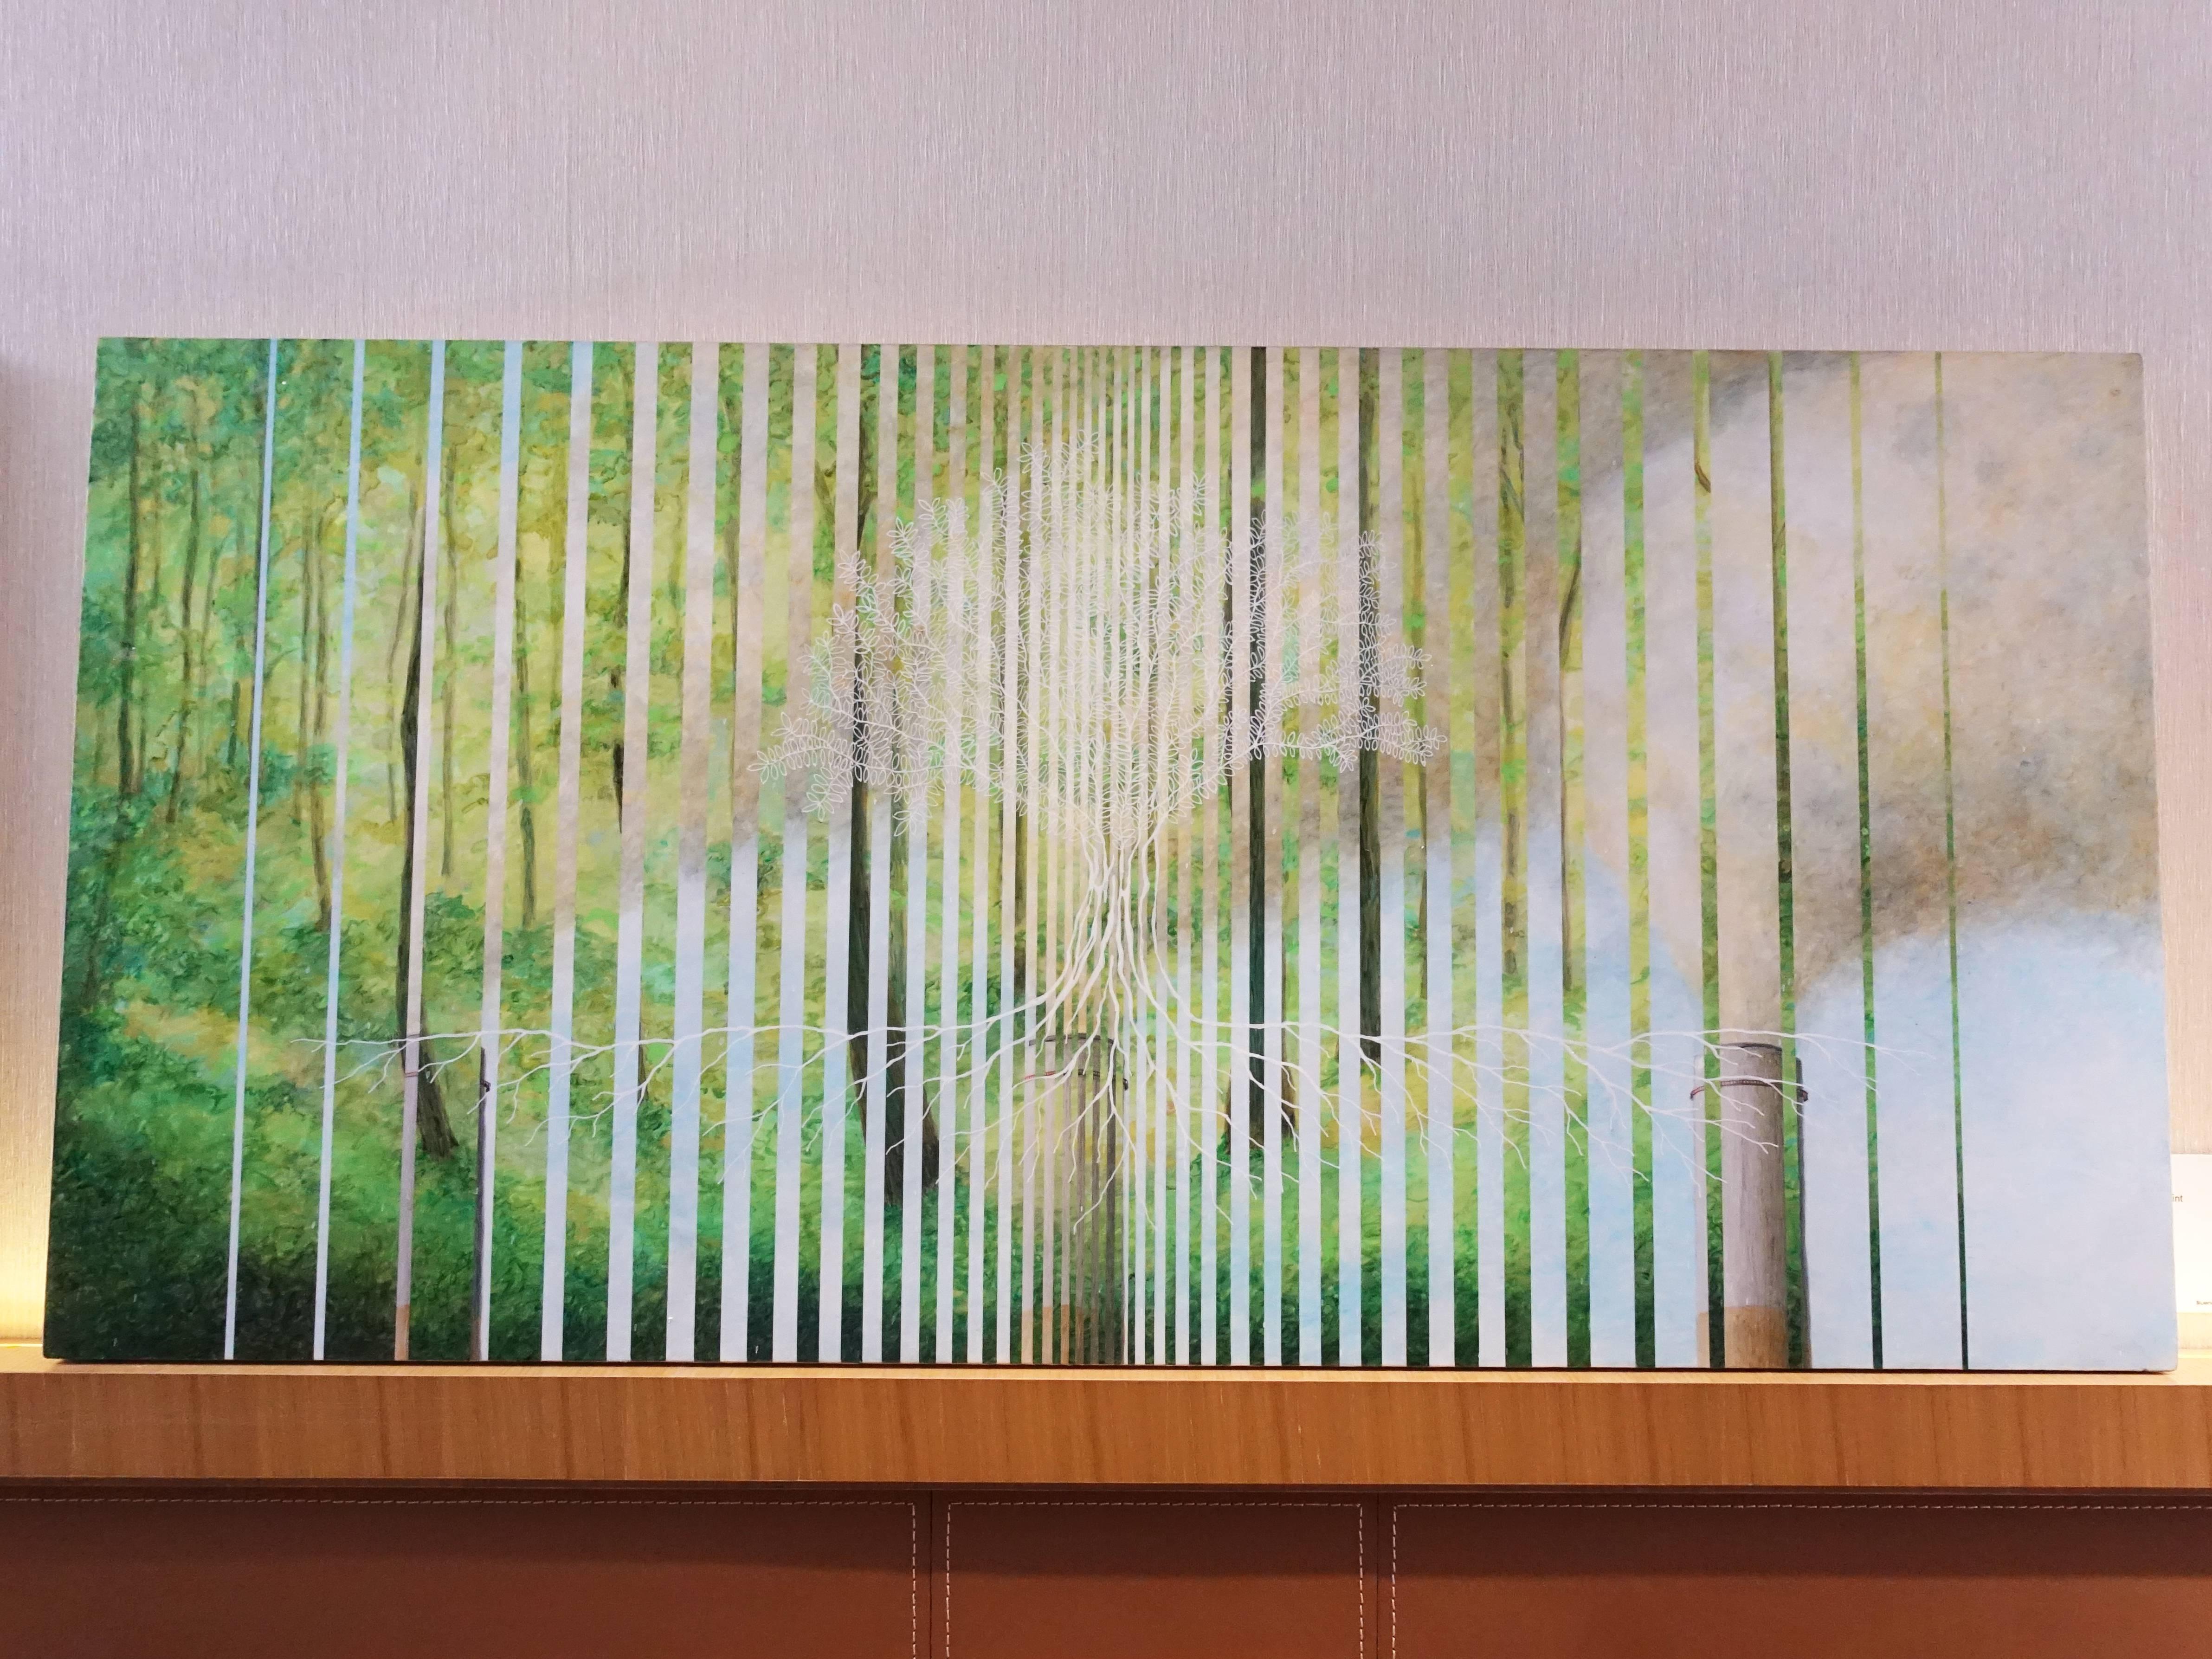 Bluerider ART 藝術家 – Bryan Lda,《Balance point》,59 x 120 cm,Acylic on panet,2018。